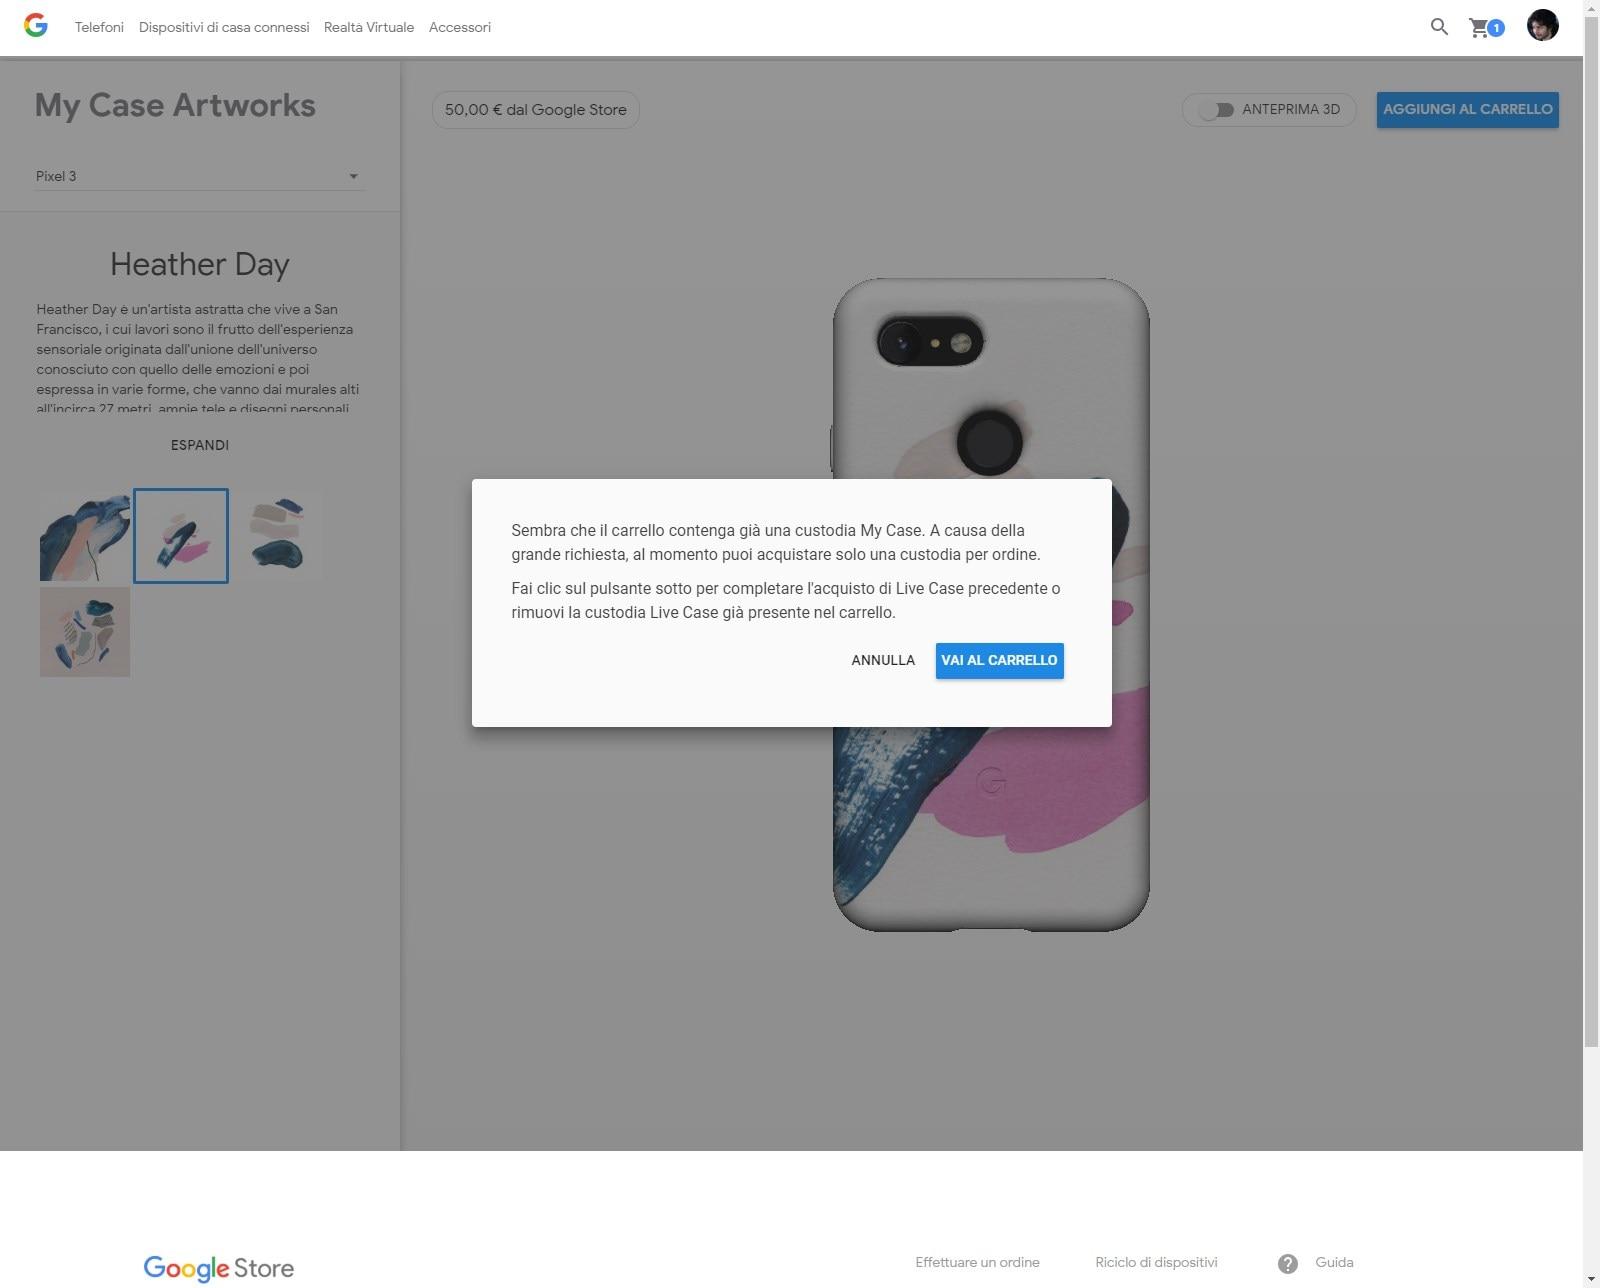 My_Case_Artworks_-_Google_Store_-_Google_Chrome-17_28_52